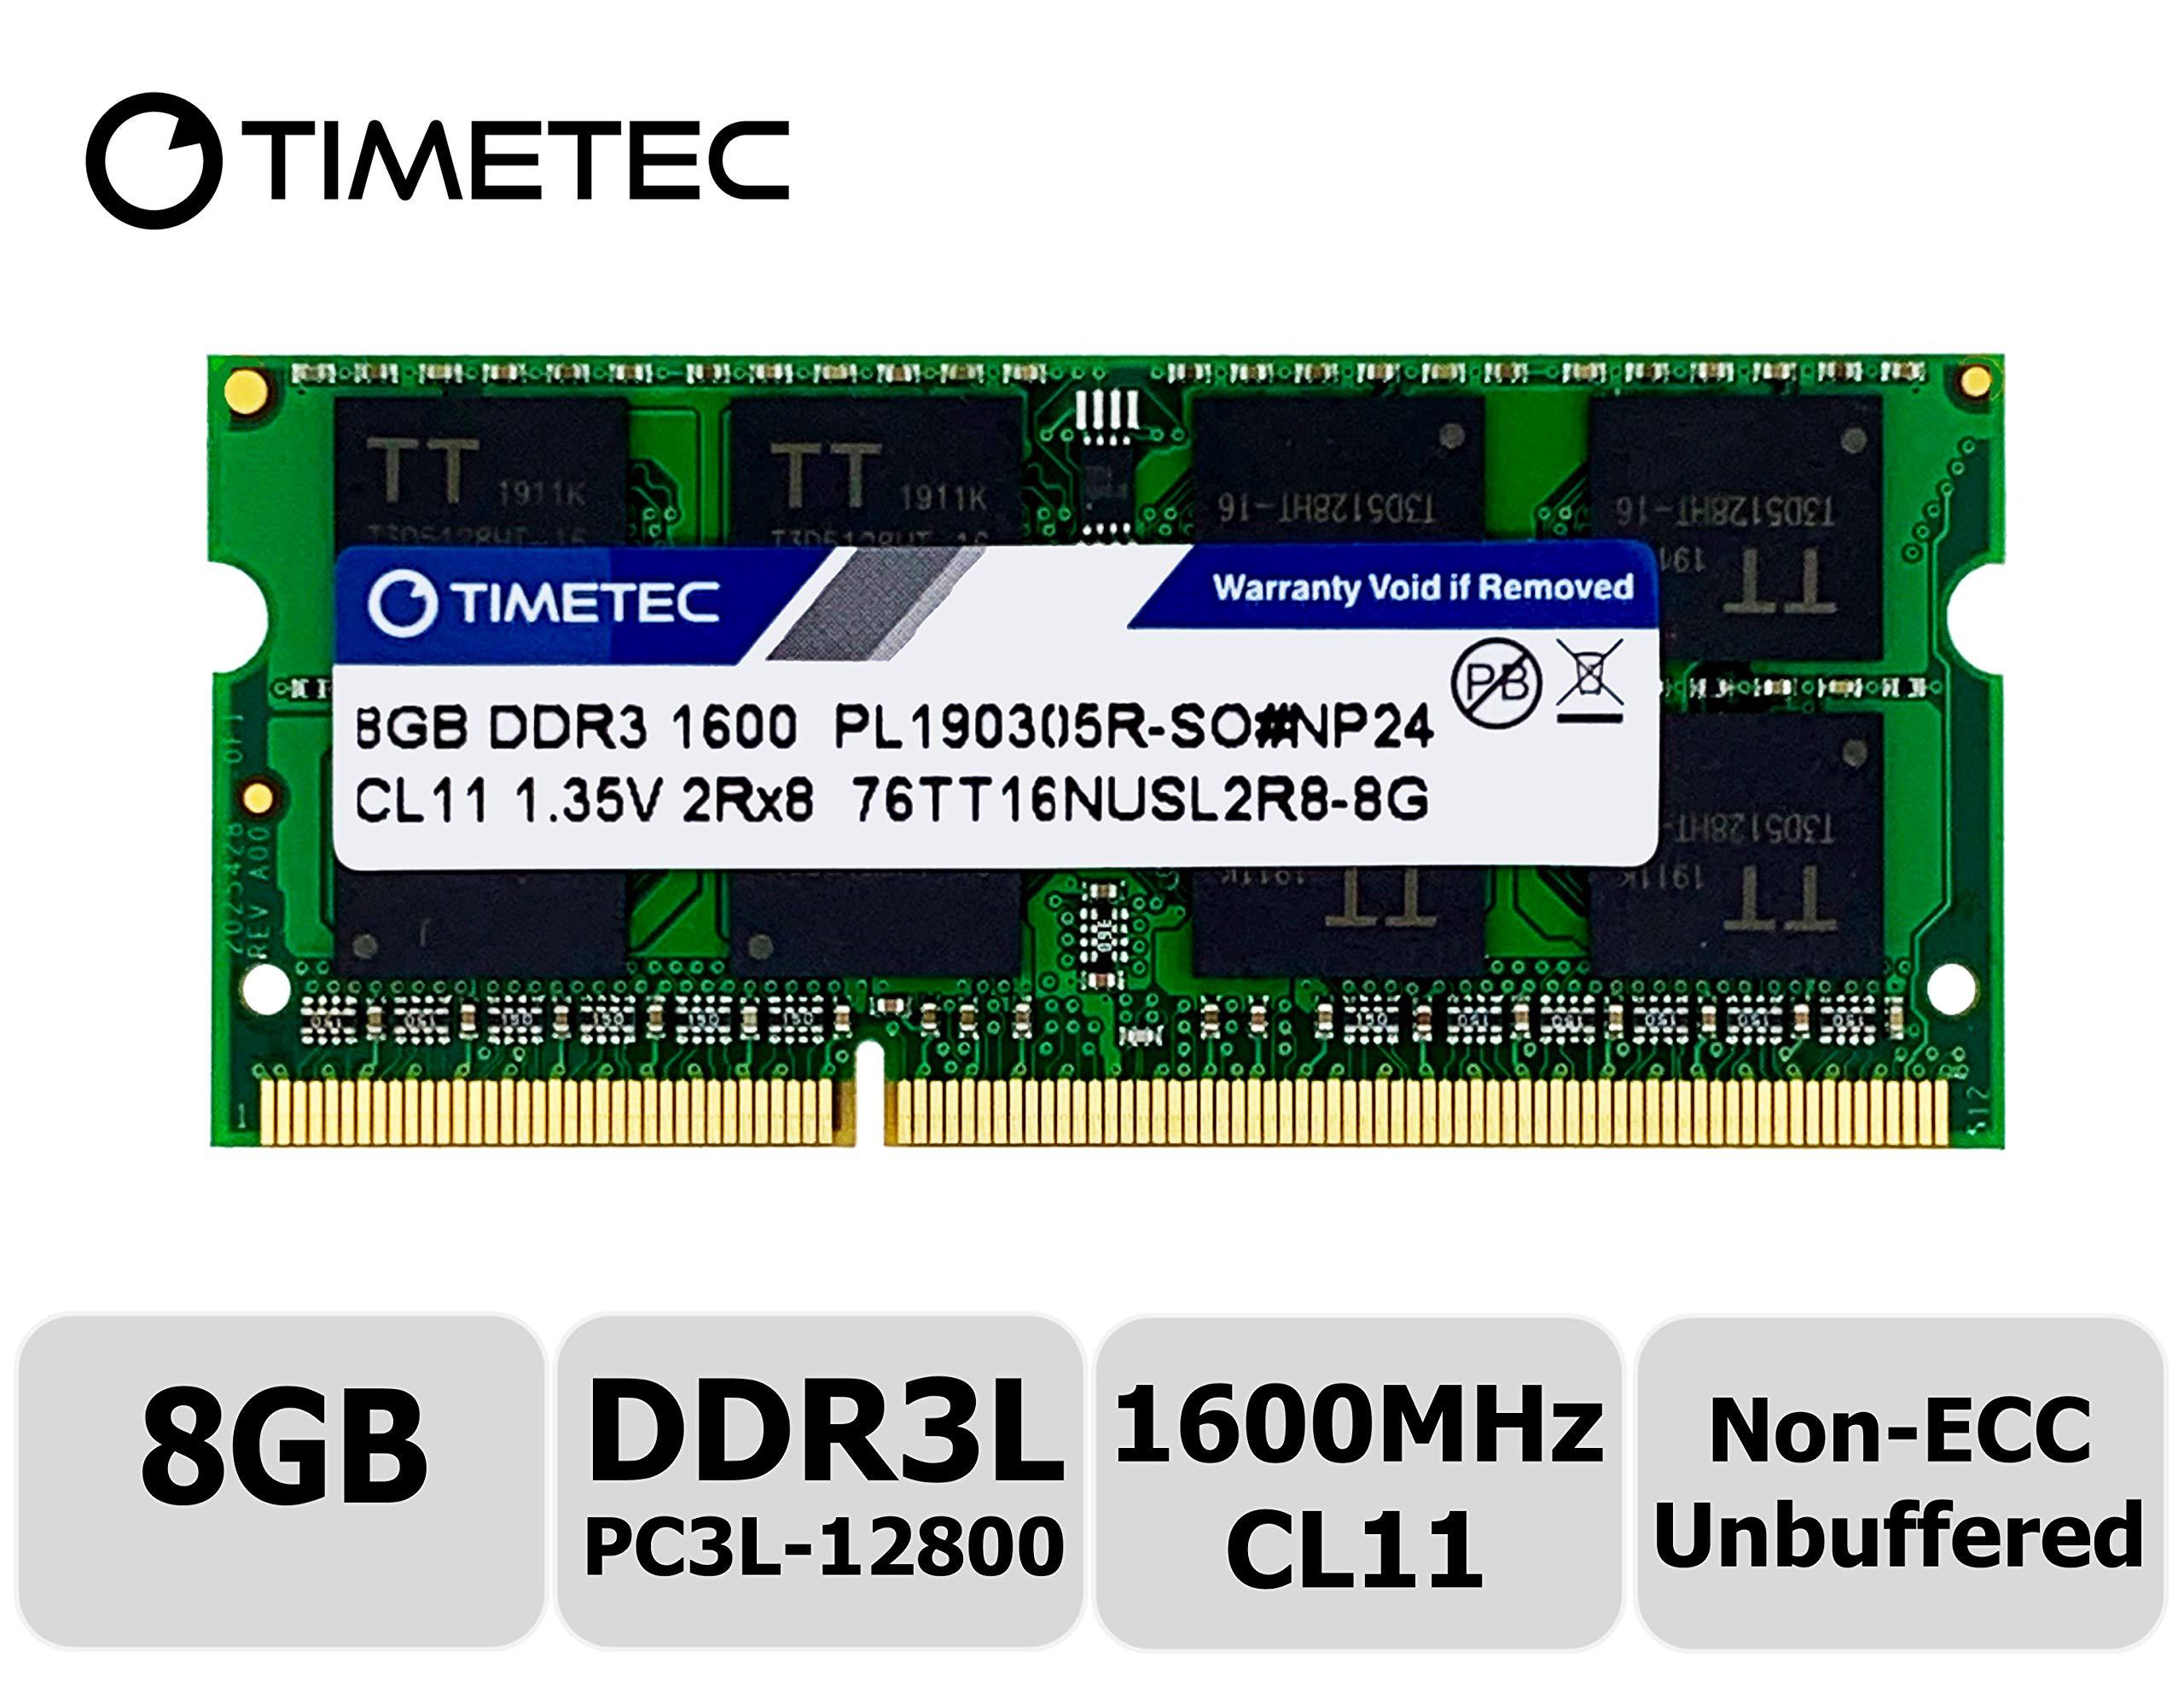 Memoria Ram 8GB DDR3 1600MHZ PC3L-12800 SODIMM TIMETEC A